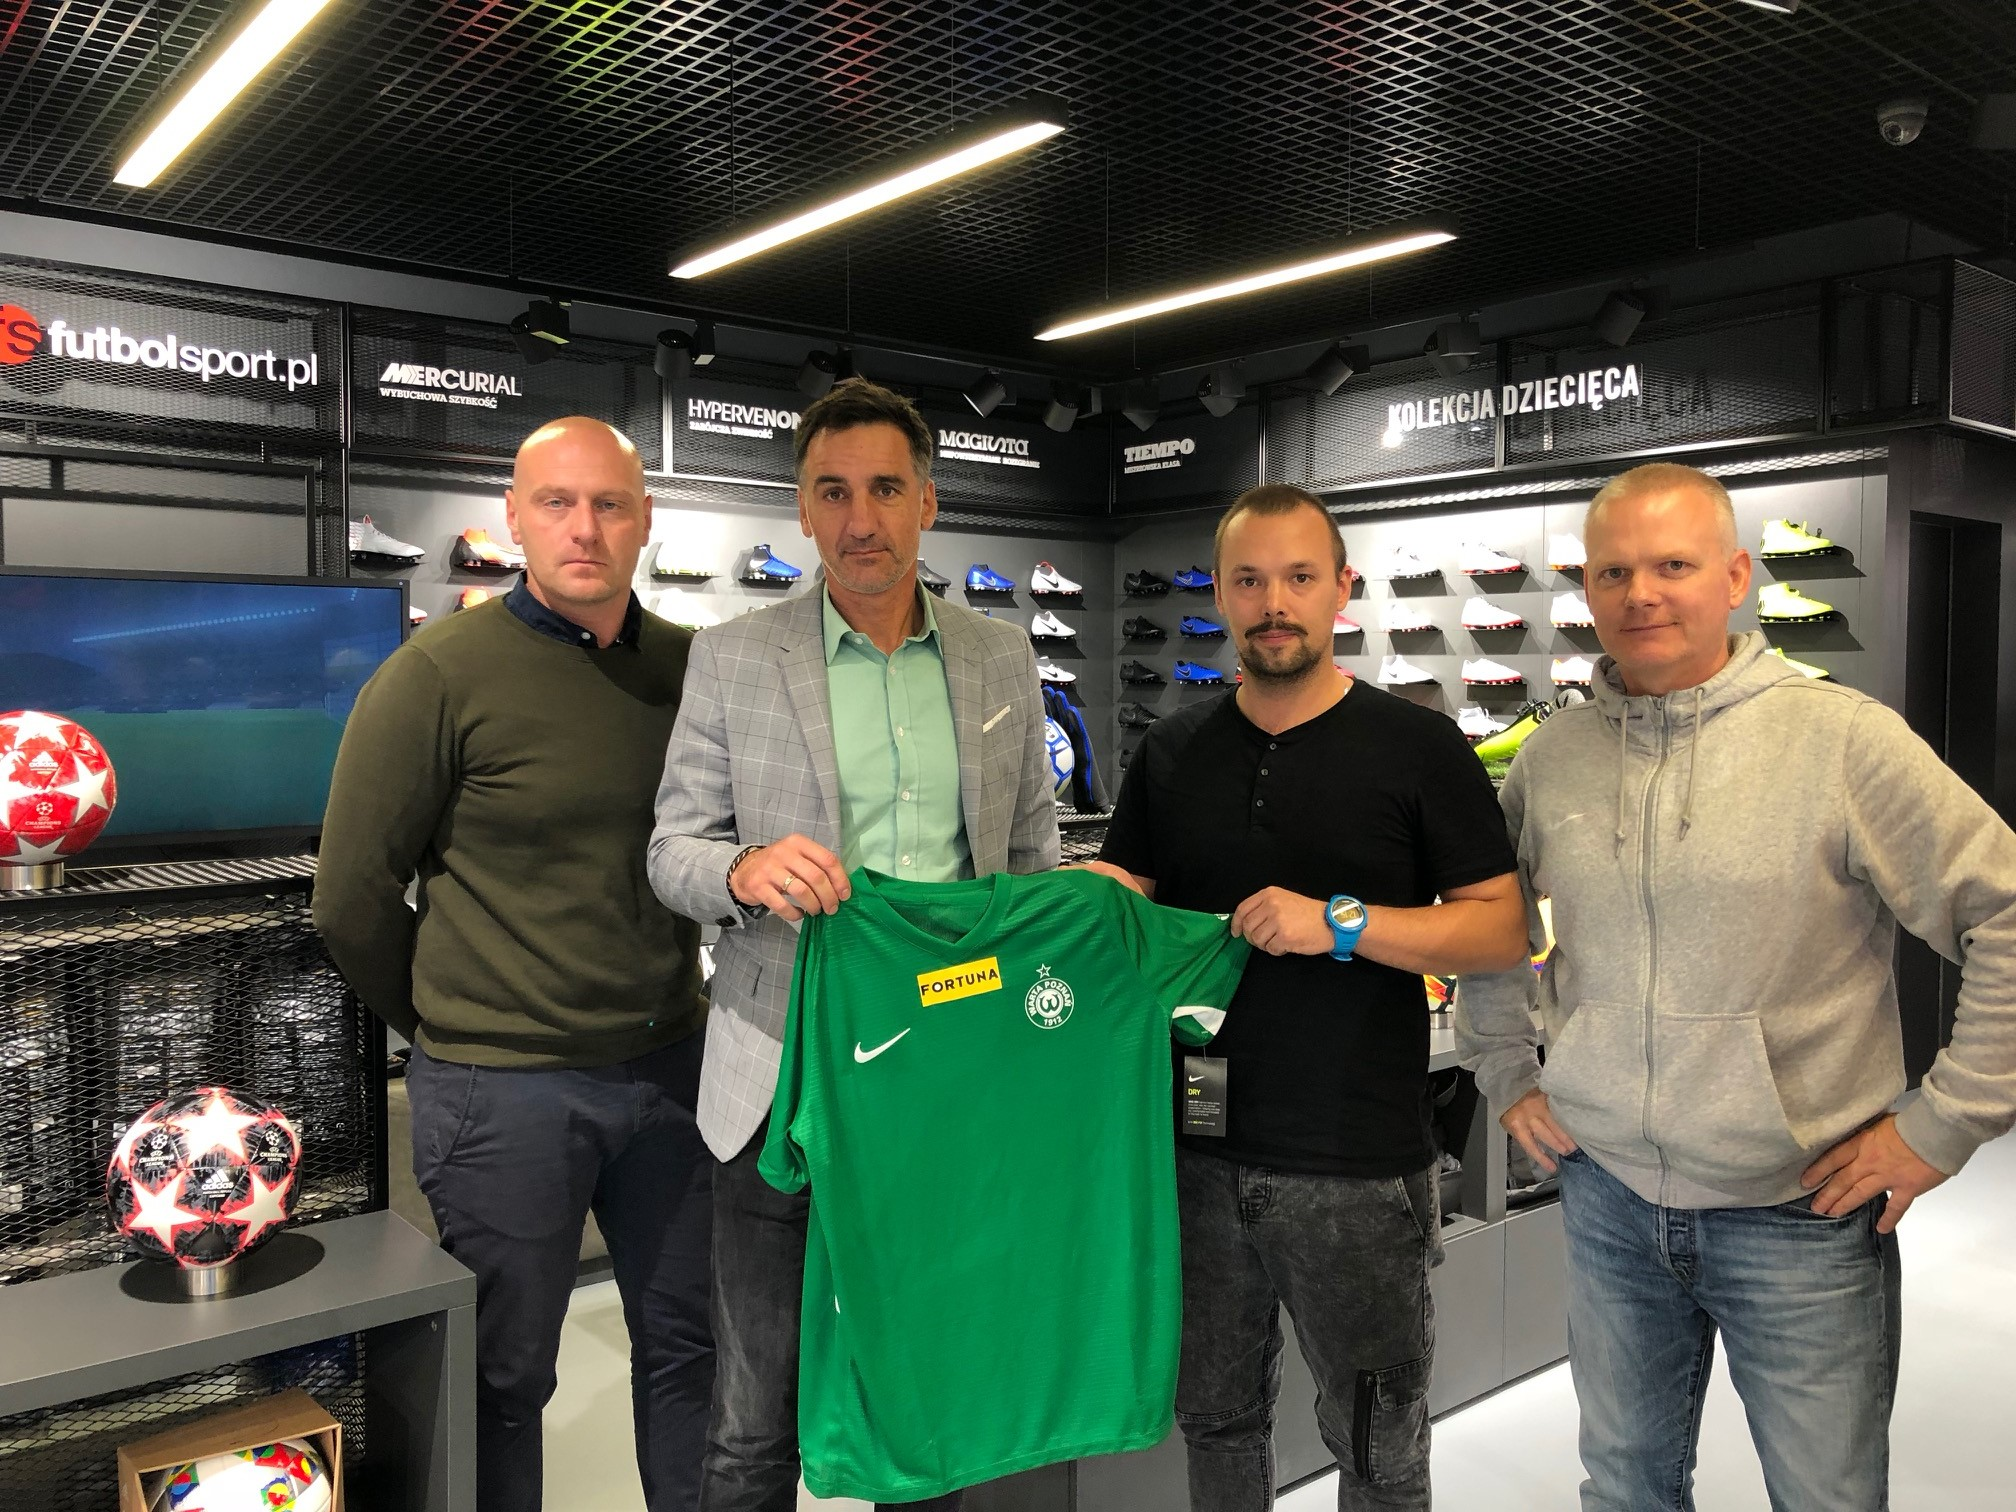 futbolsport partner techniczny